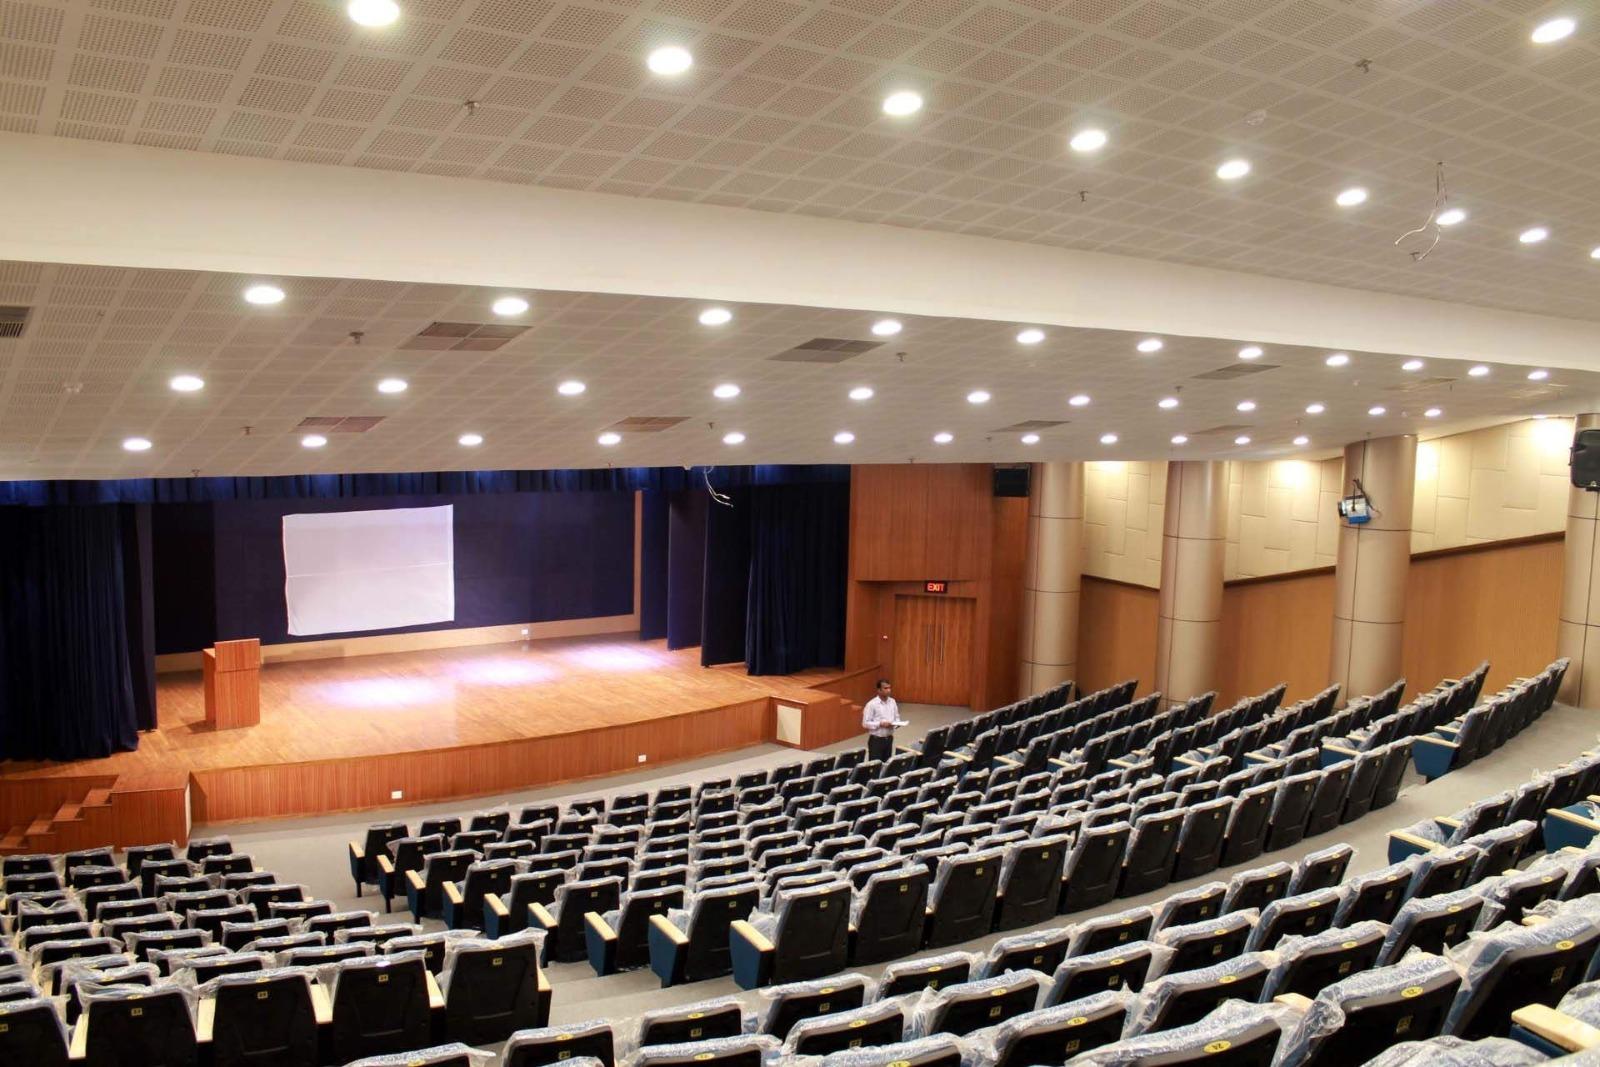 I need someone to decorate my auditorium